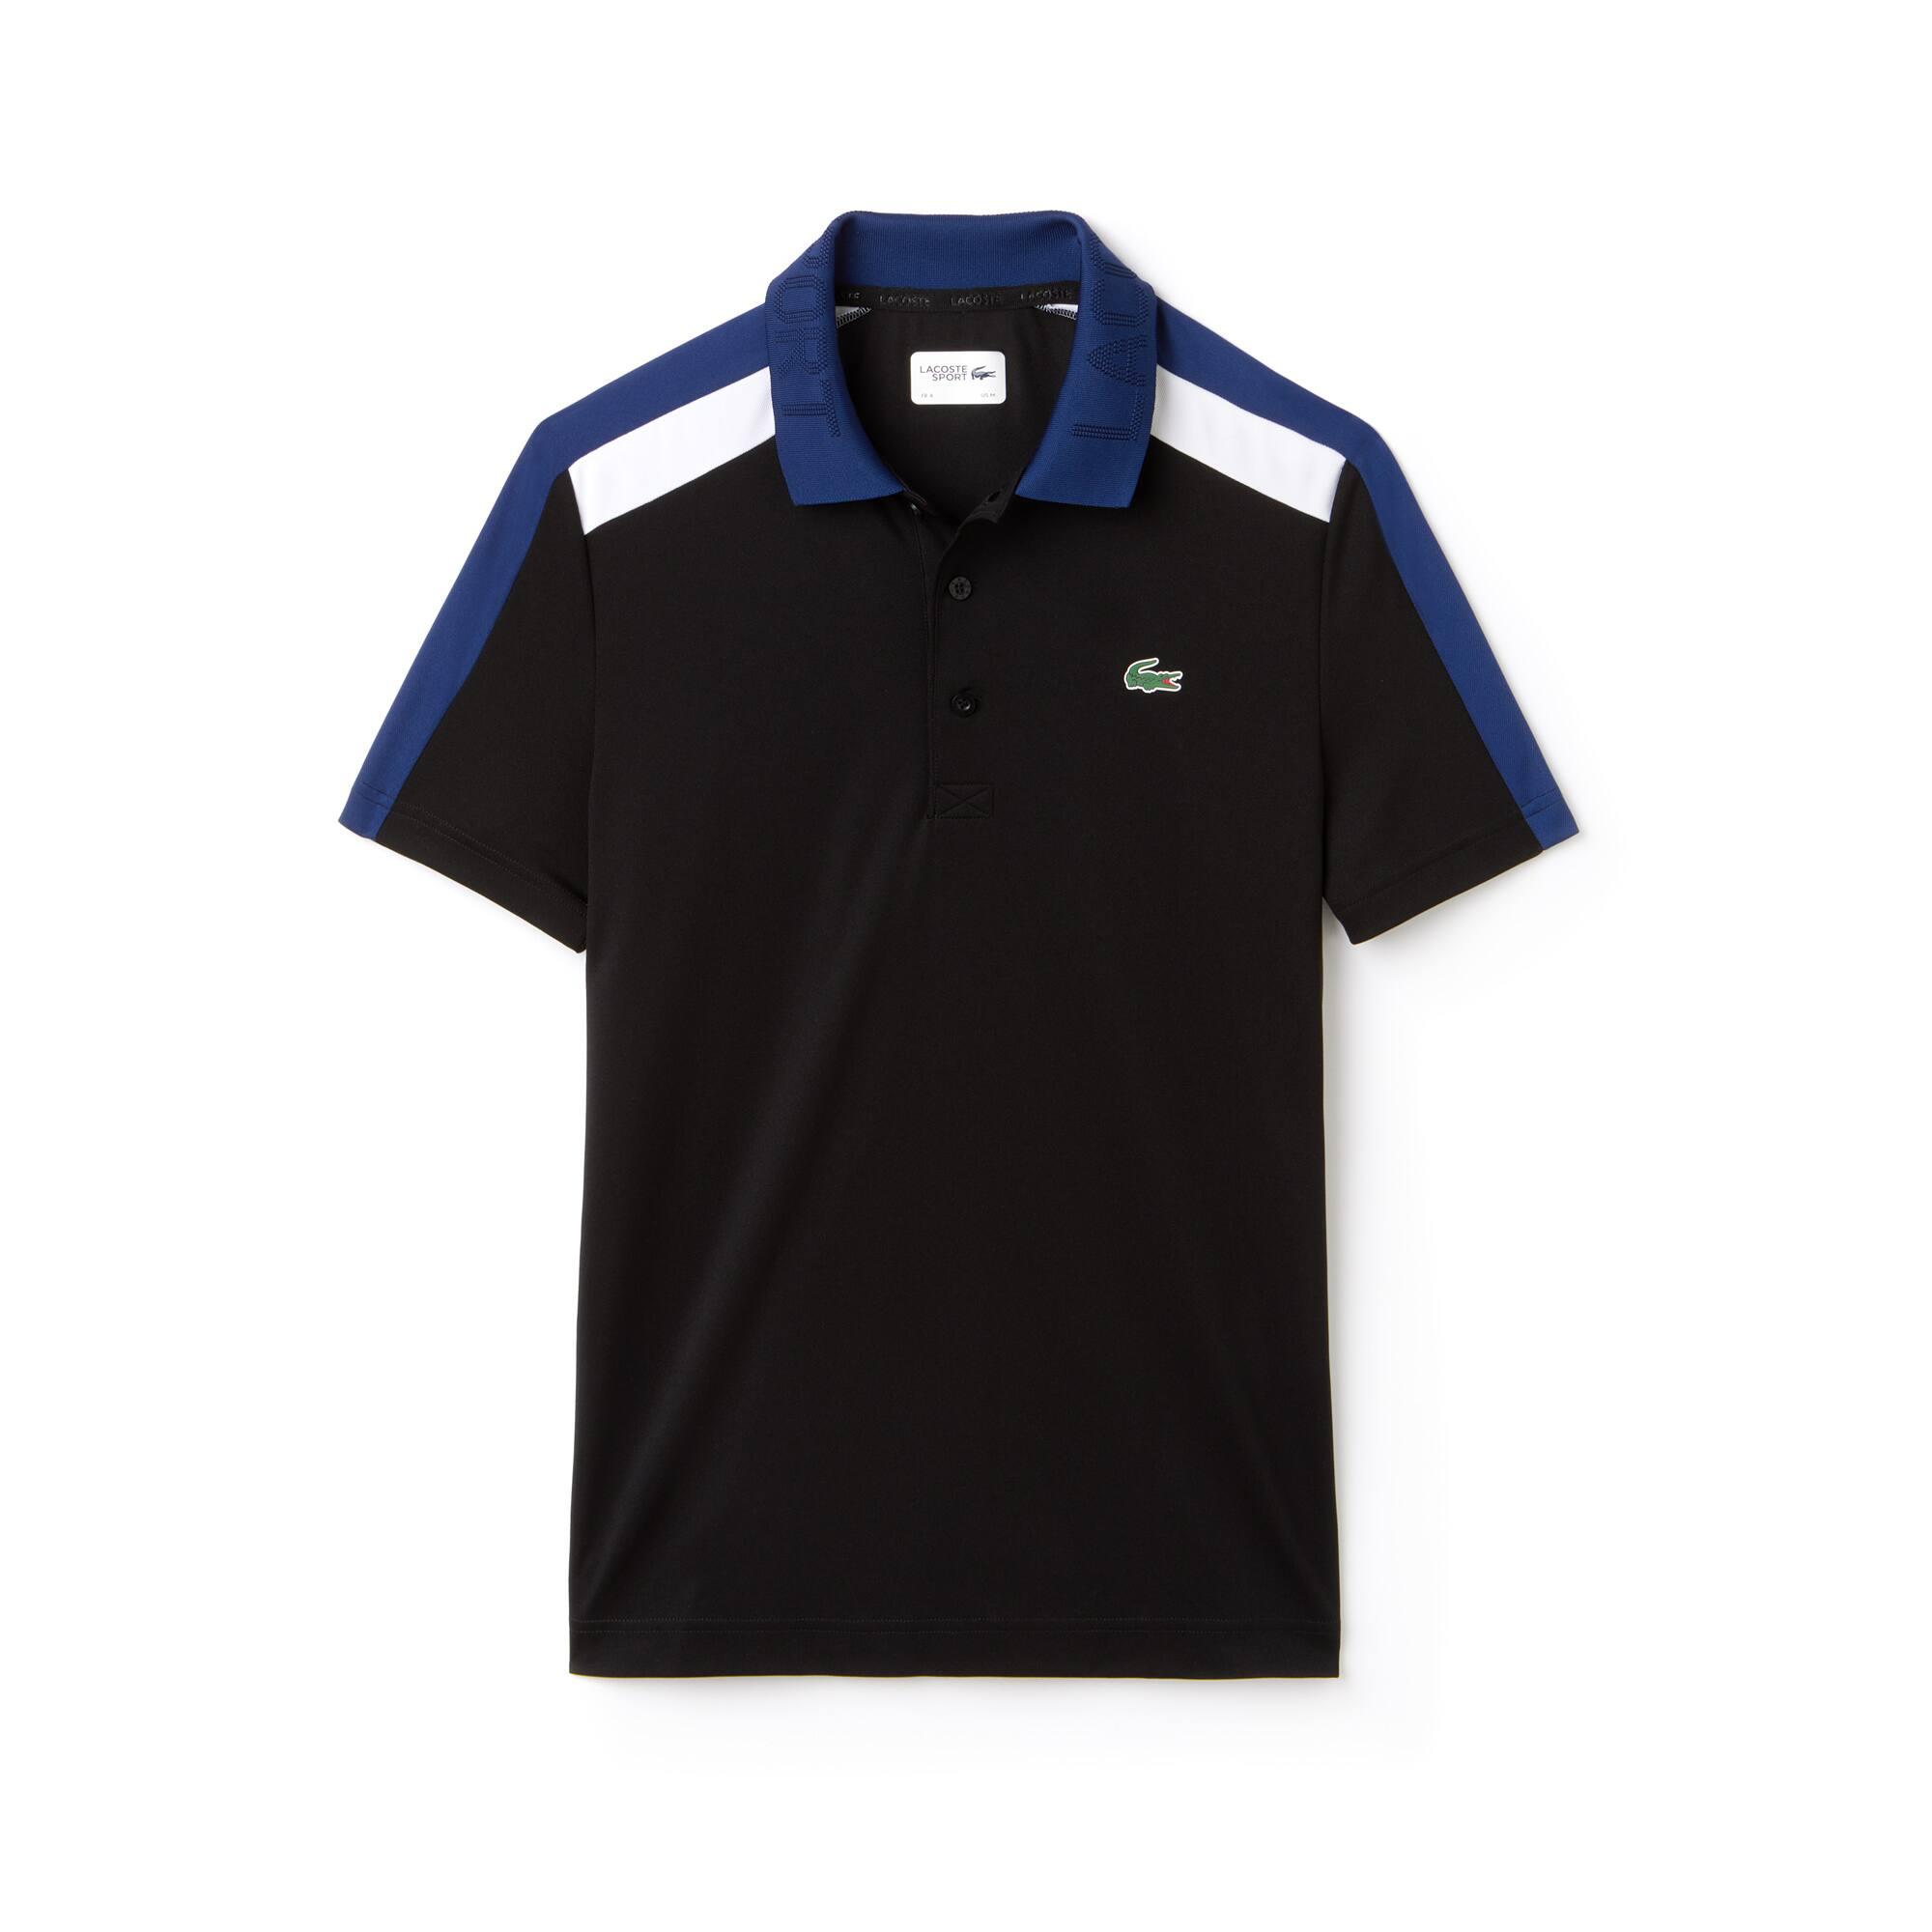 Lacoste - Herren LACOSTE SPORT Tennis-Poloshirt mit Kontraststreifen - 3